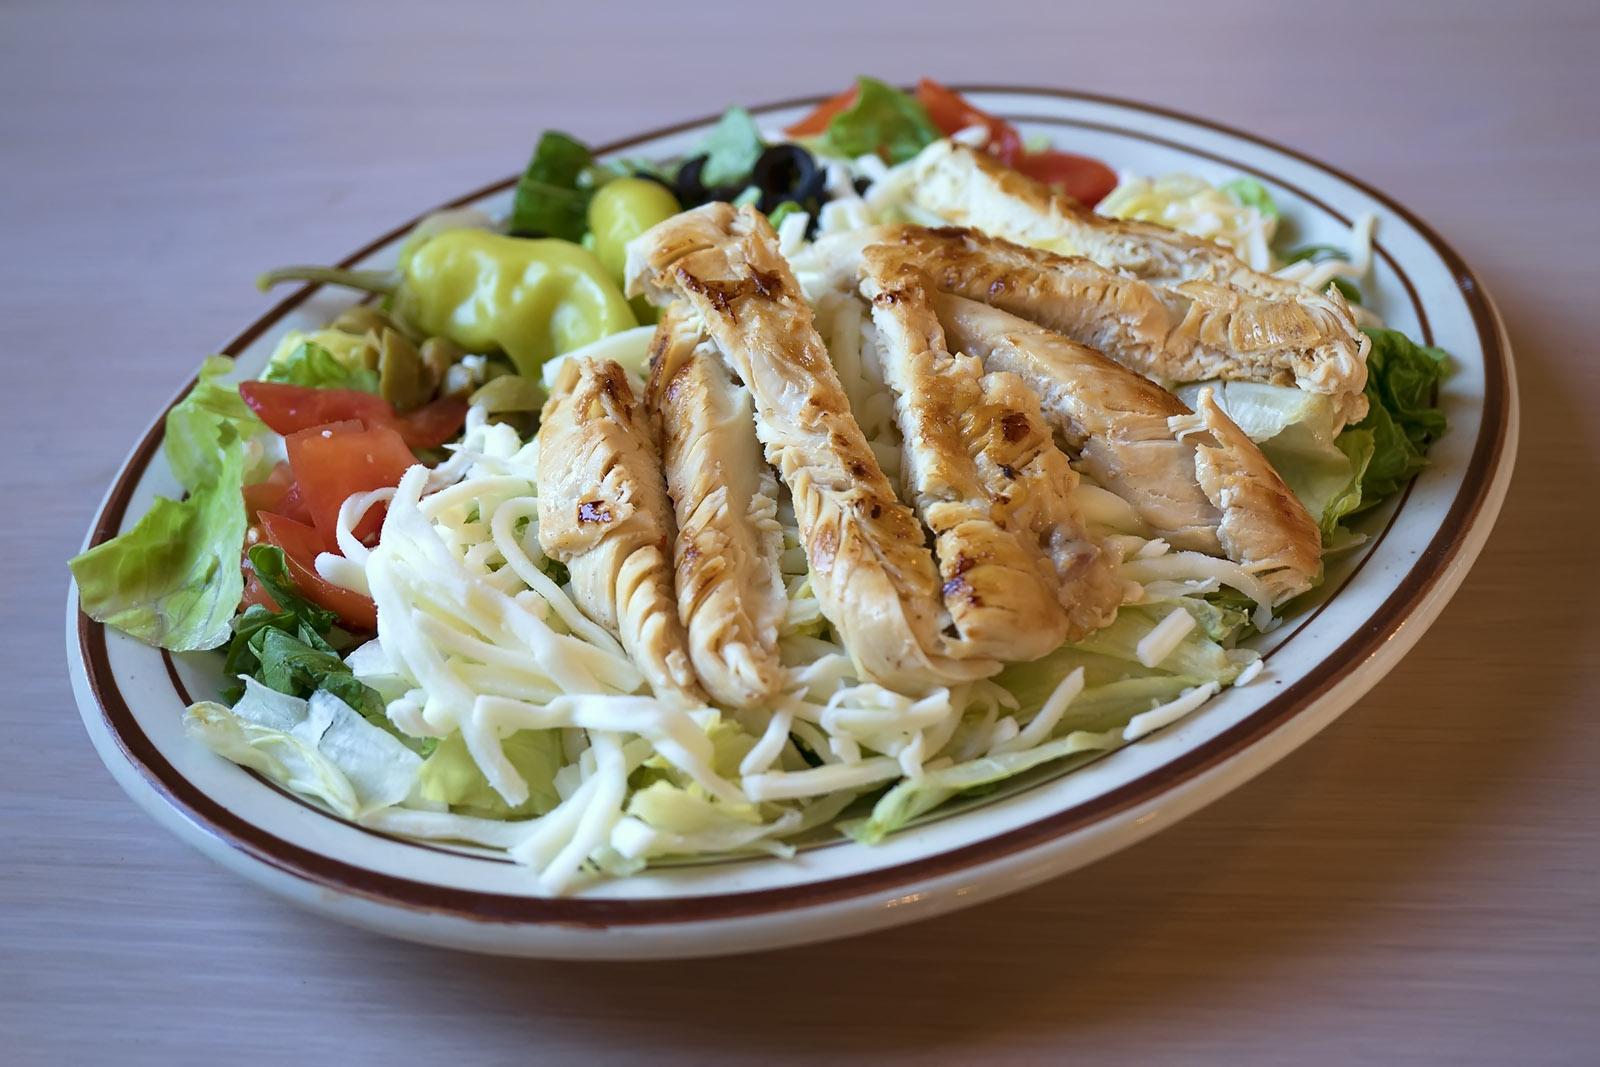 WEDNESDAY: Grilled Chicken Salad Image